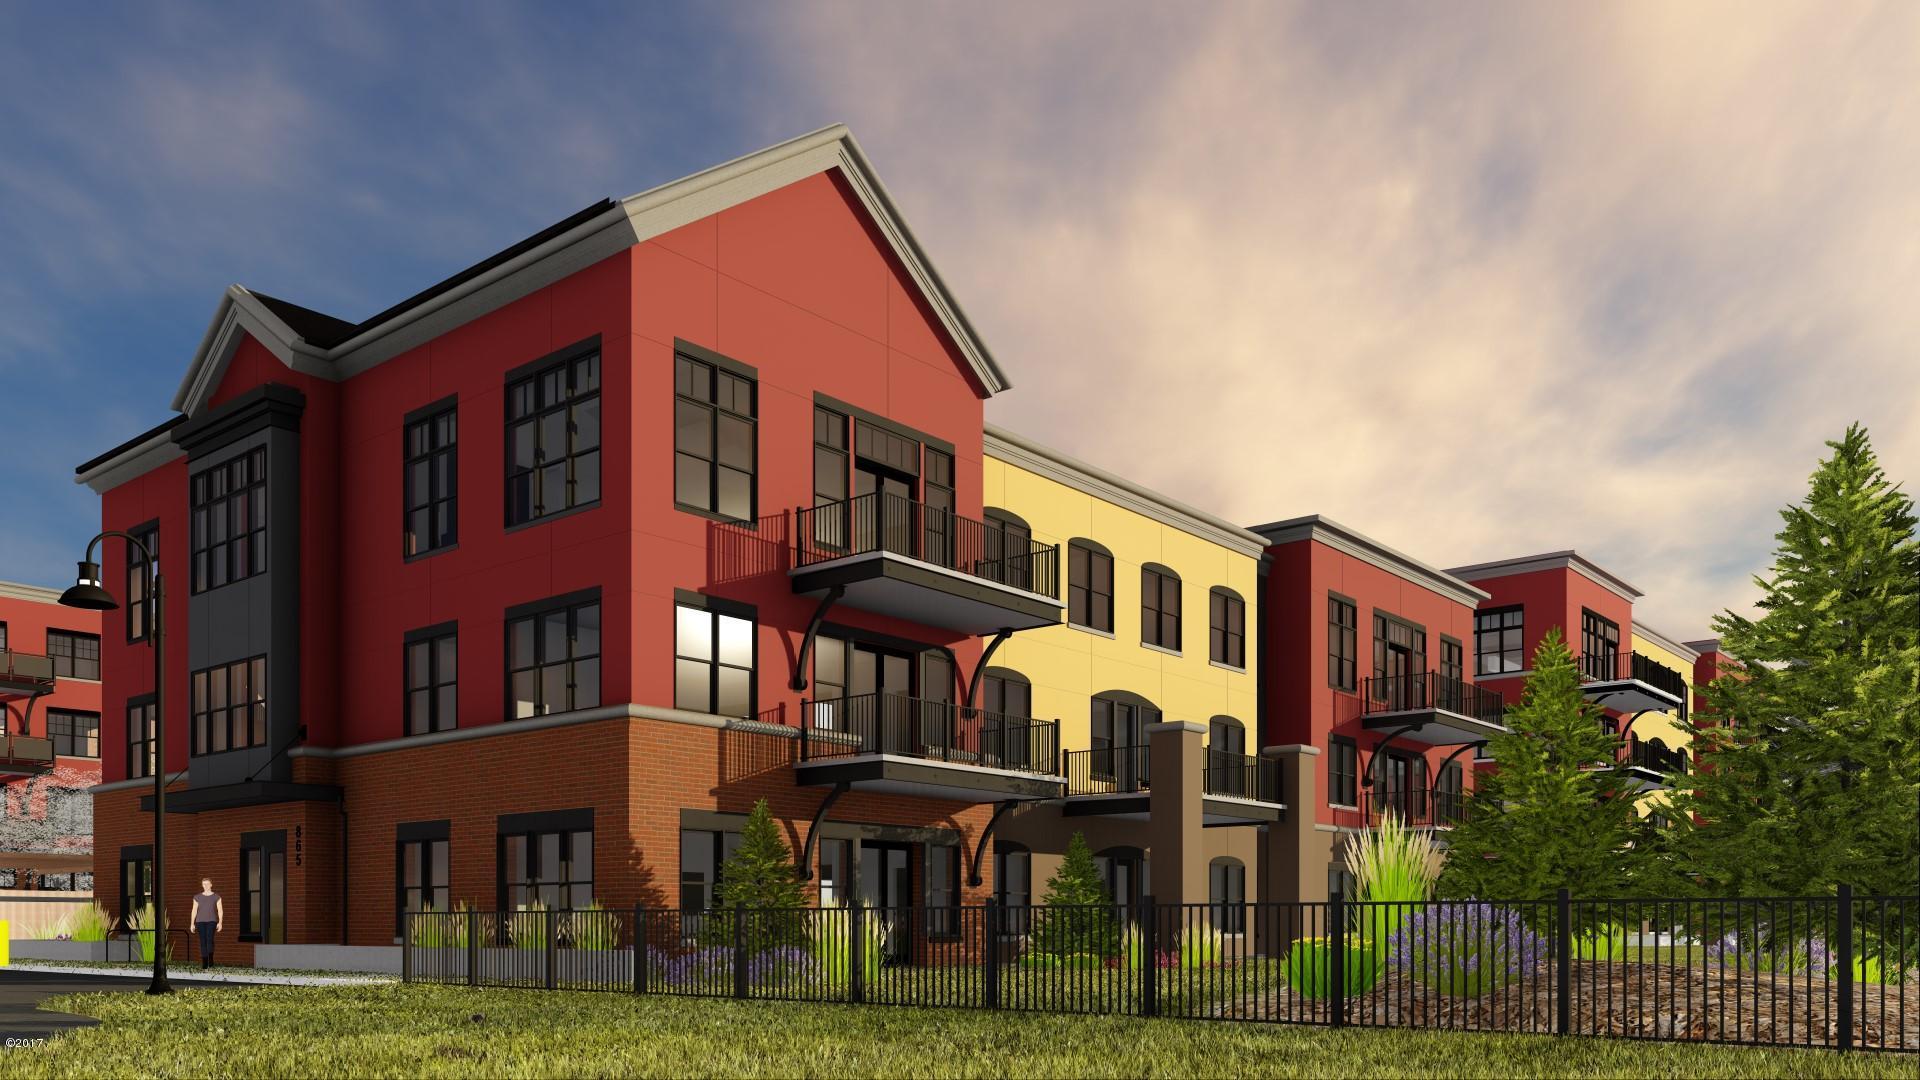 865 Wyoming Street, Suite 101, Missoula, MT 59801